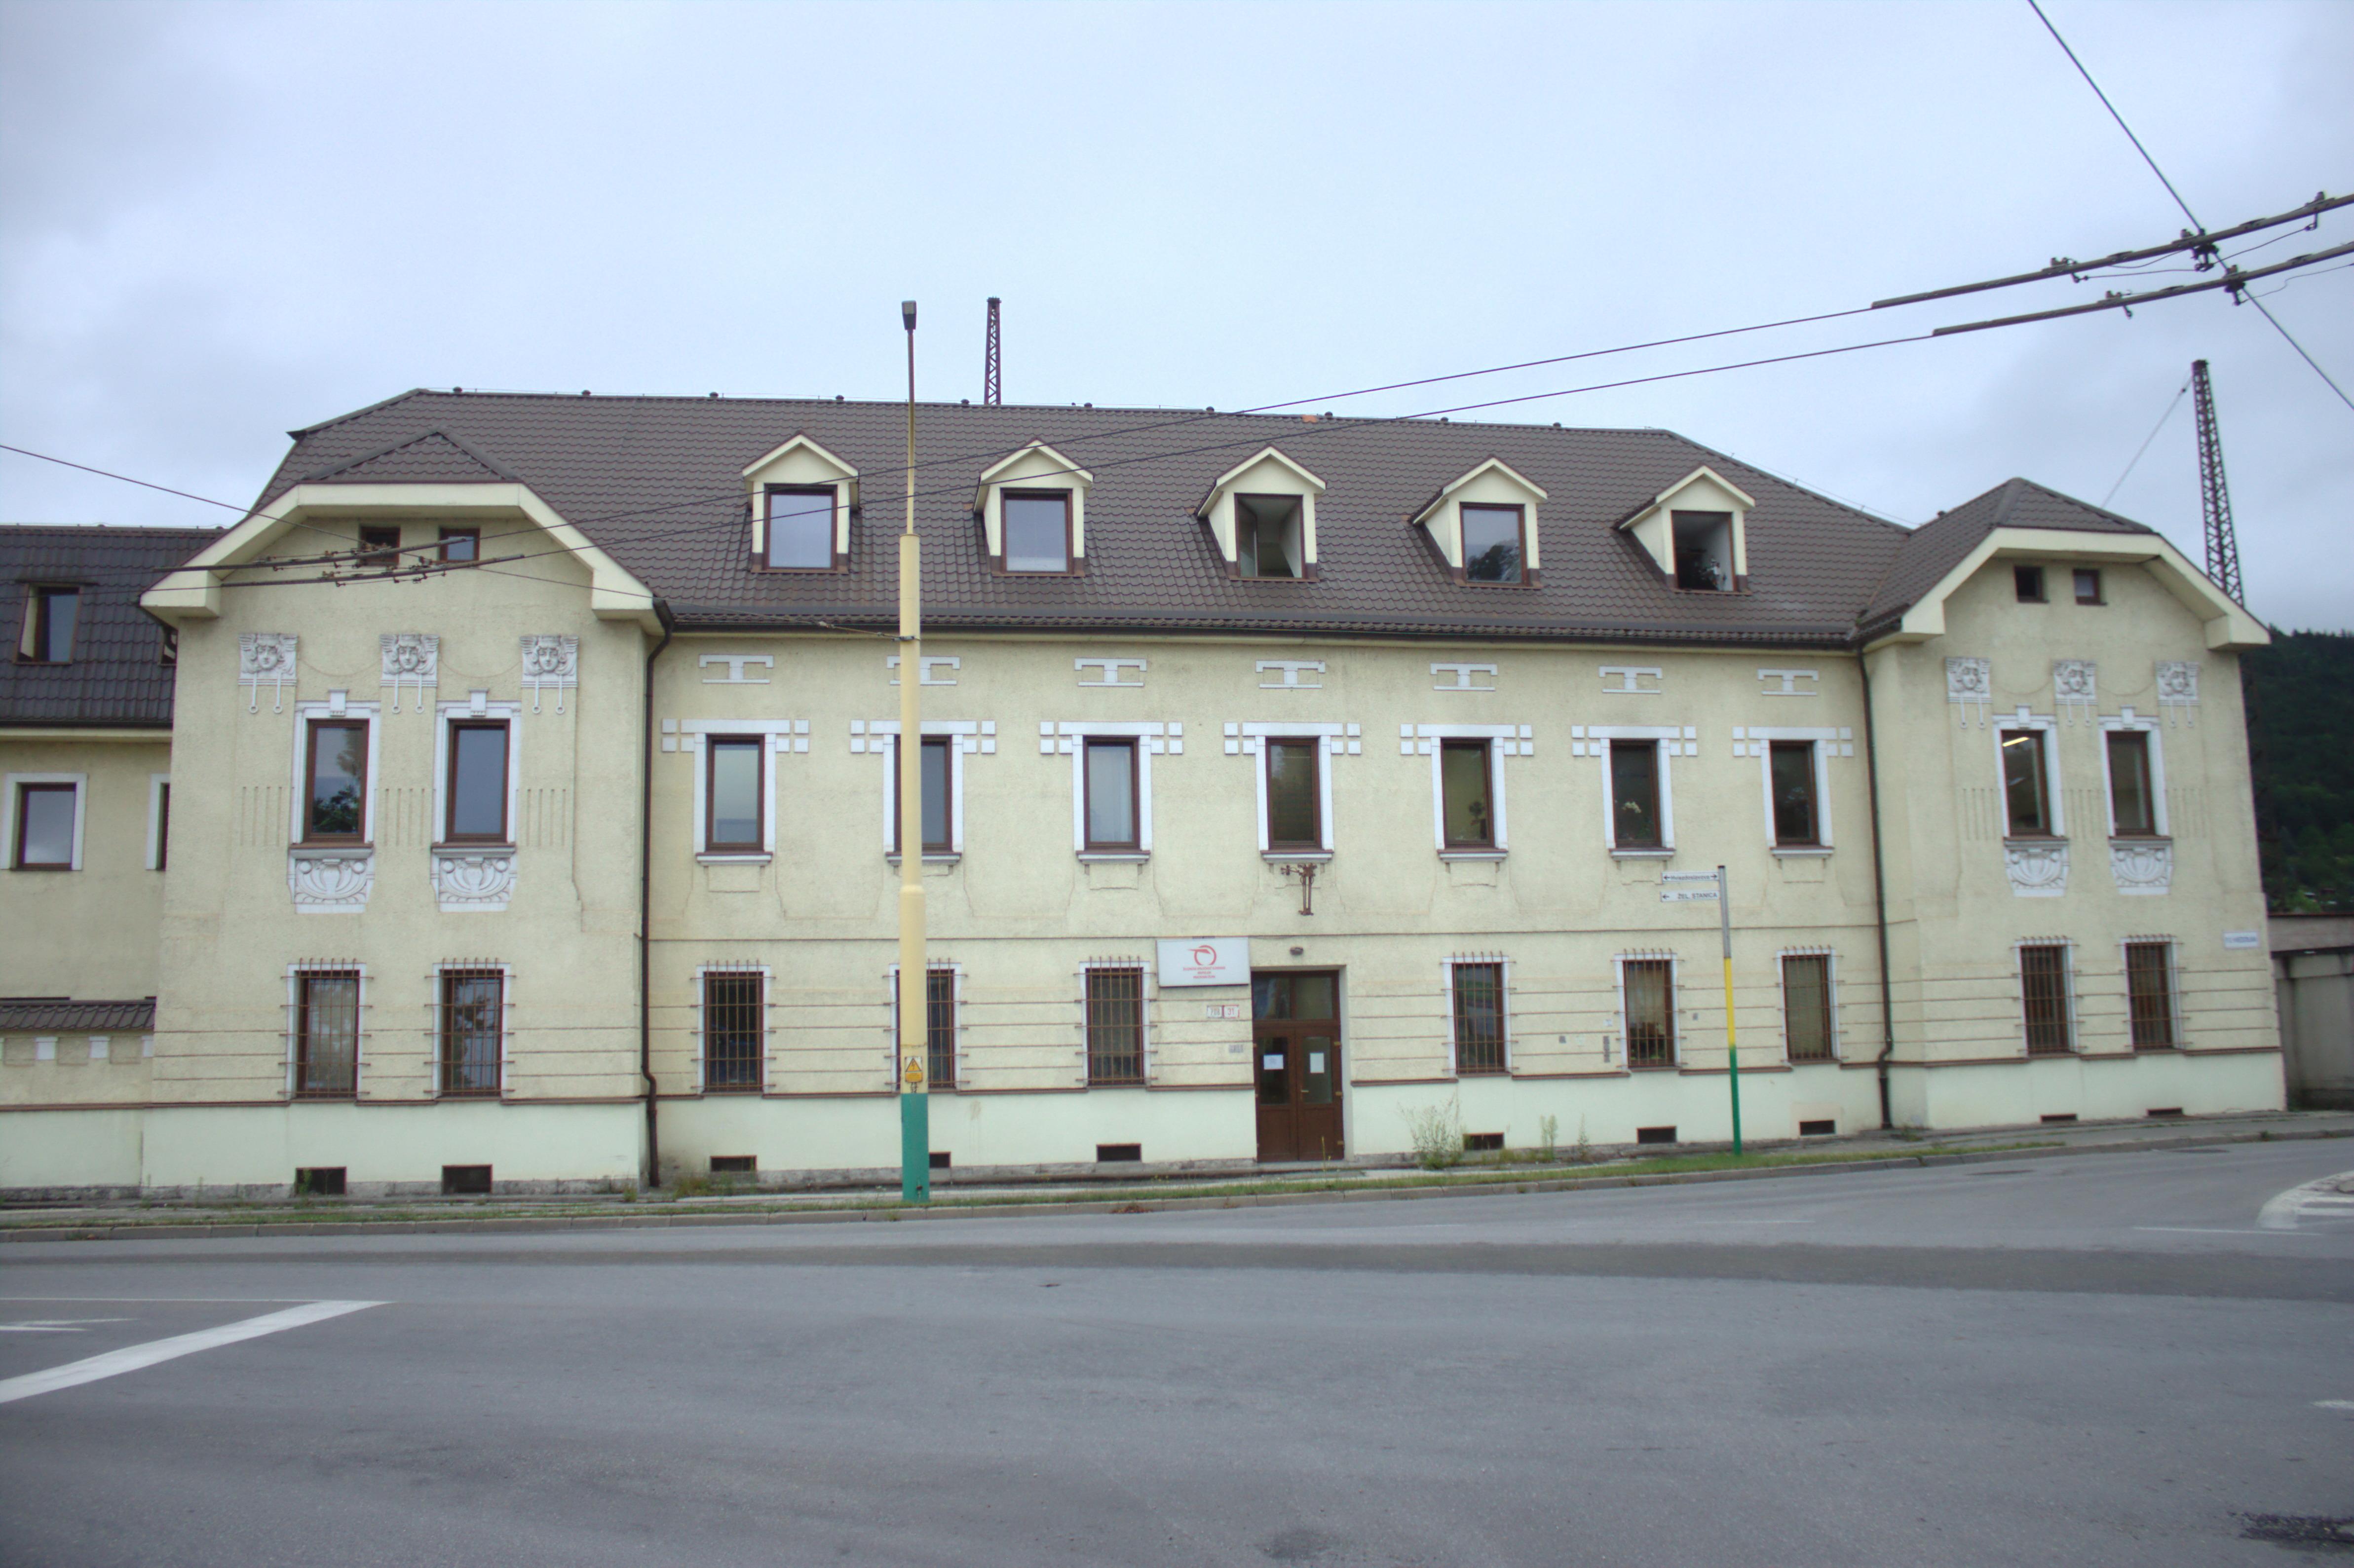 b4ec53c97 File:Žilina, budova u nádraží II.jpg - Wikimedia Commons